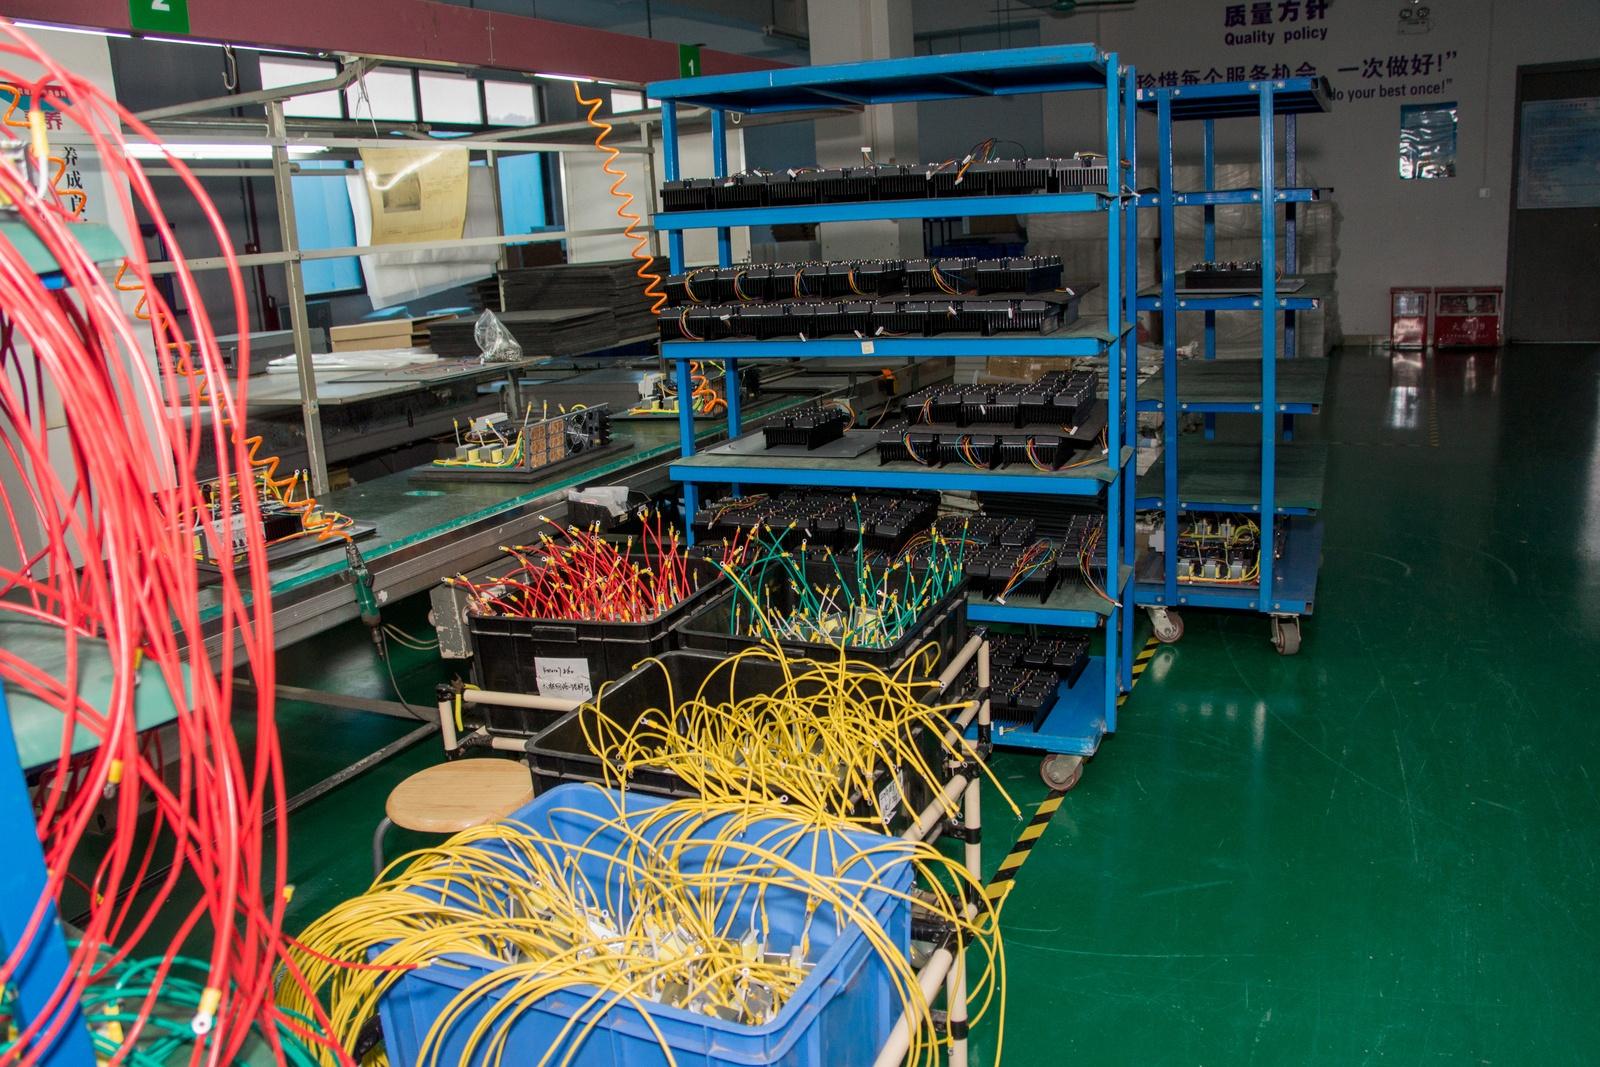 Китай. Завод устройств для «Умного дома». Учимся и учим - 35